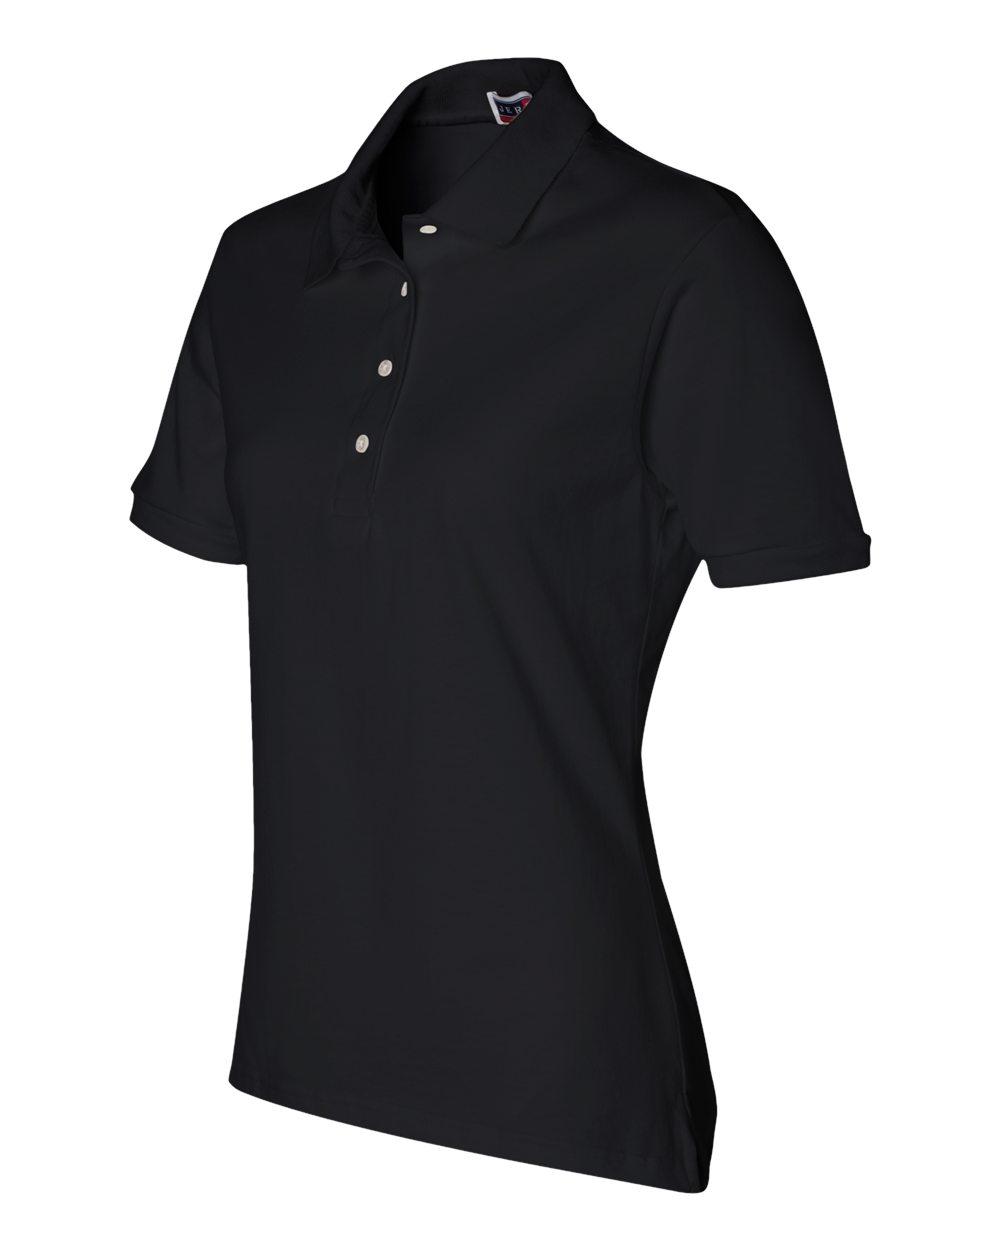 Jerzees-Women-039-s-5-6-oz-50-50-Jersey-Polo-with-SpotShield-437W-S-2XL thumbnail 15